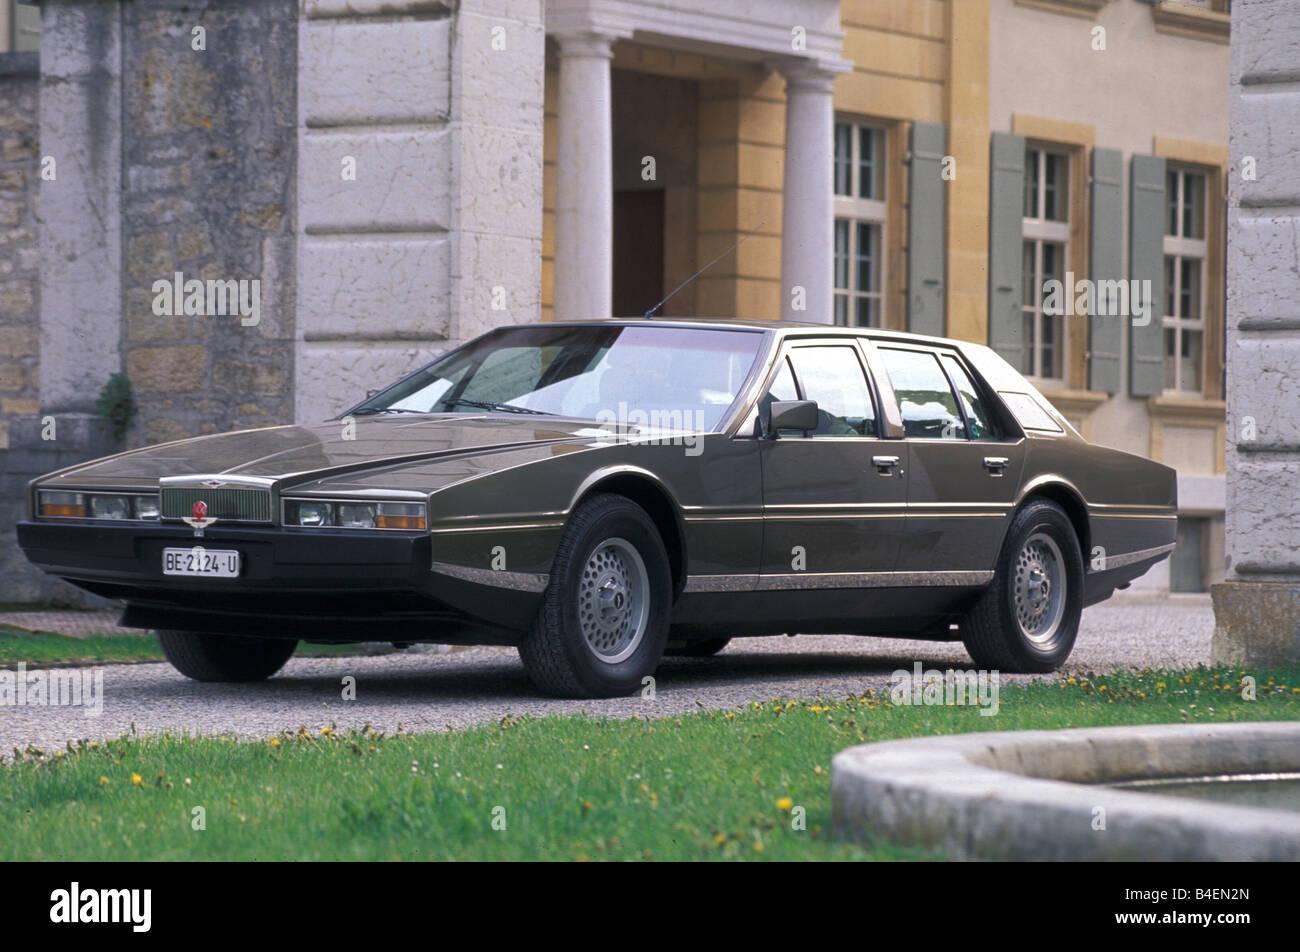 Car Aston Martin Lagonda Model Year 1978 1989 Old Car 1970s